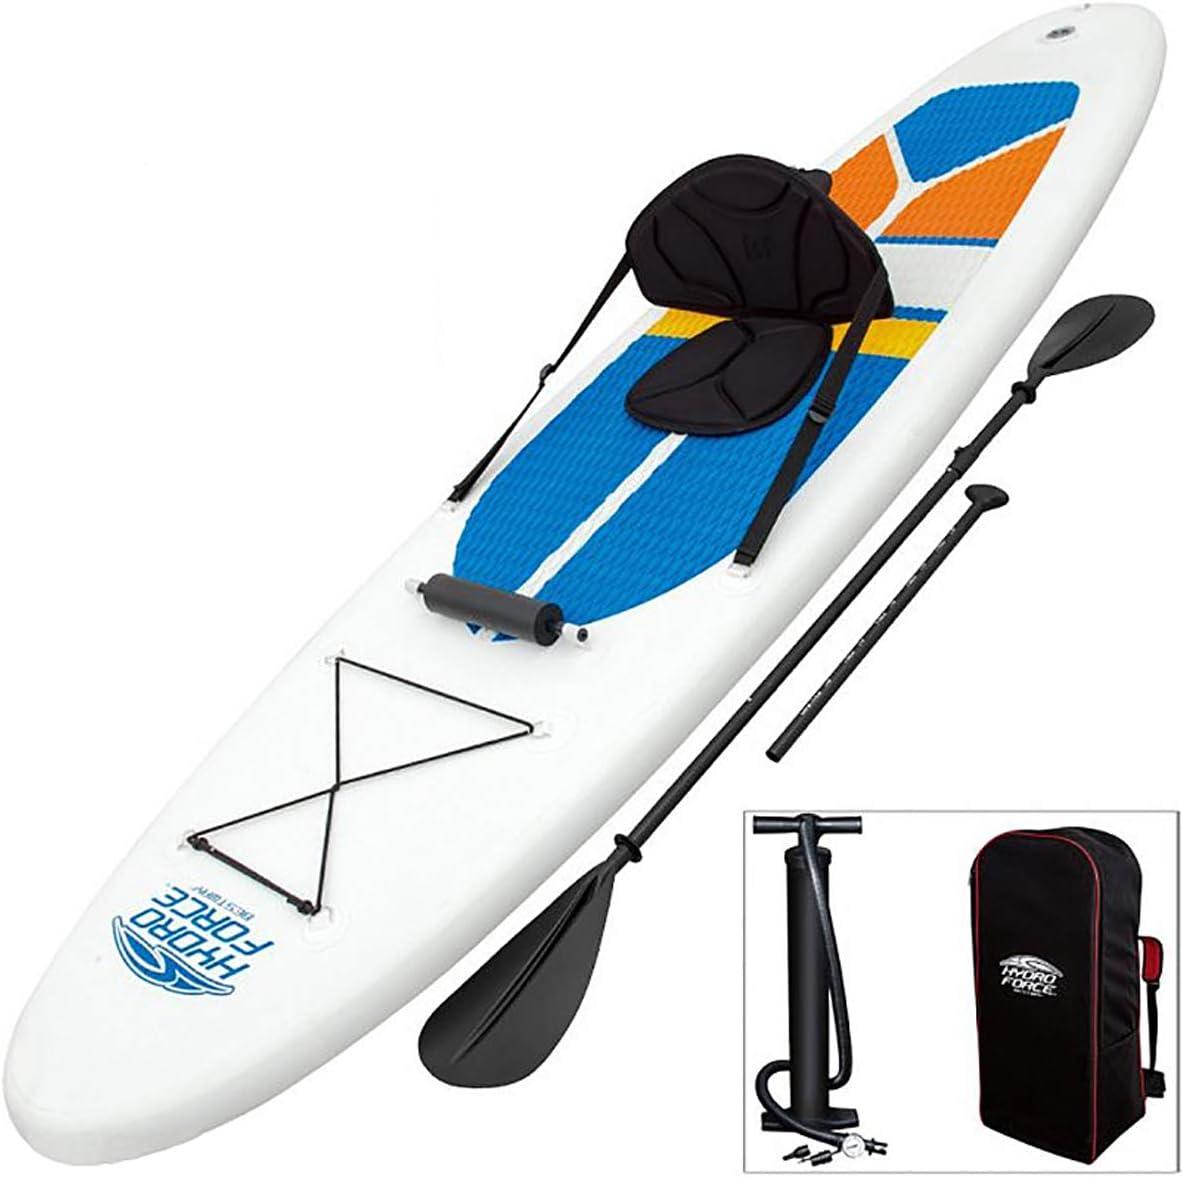 SUP スタンドアップパドルボード Surfboard ロングボード 安定性抜群 本体、フィン、パドル、バックパック、ハンドポンプ、補修キット